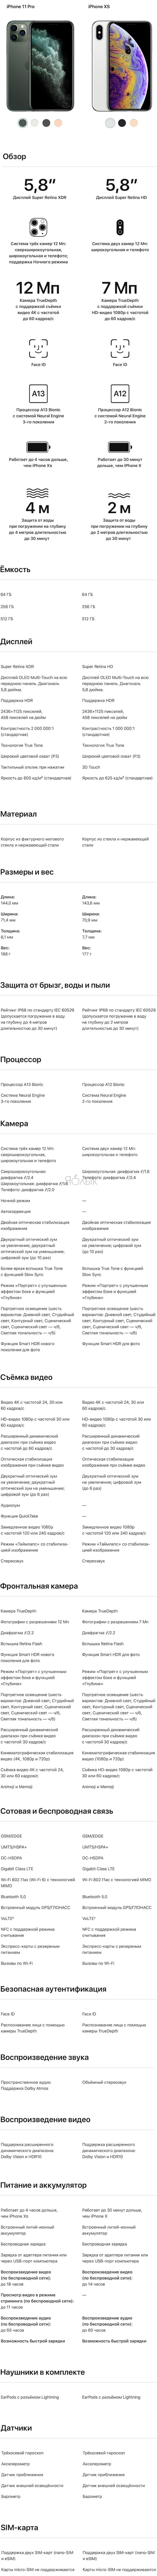 Сравнение технических характеристик (спецификаций) iPhone 11 Pro и iPhone XS